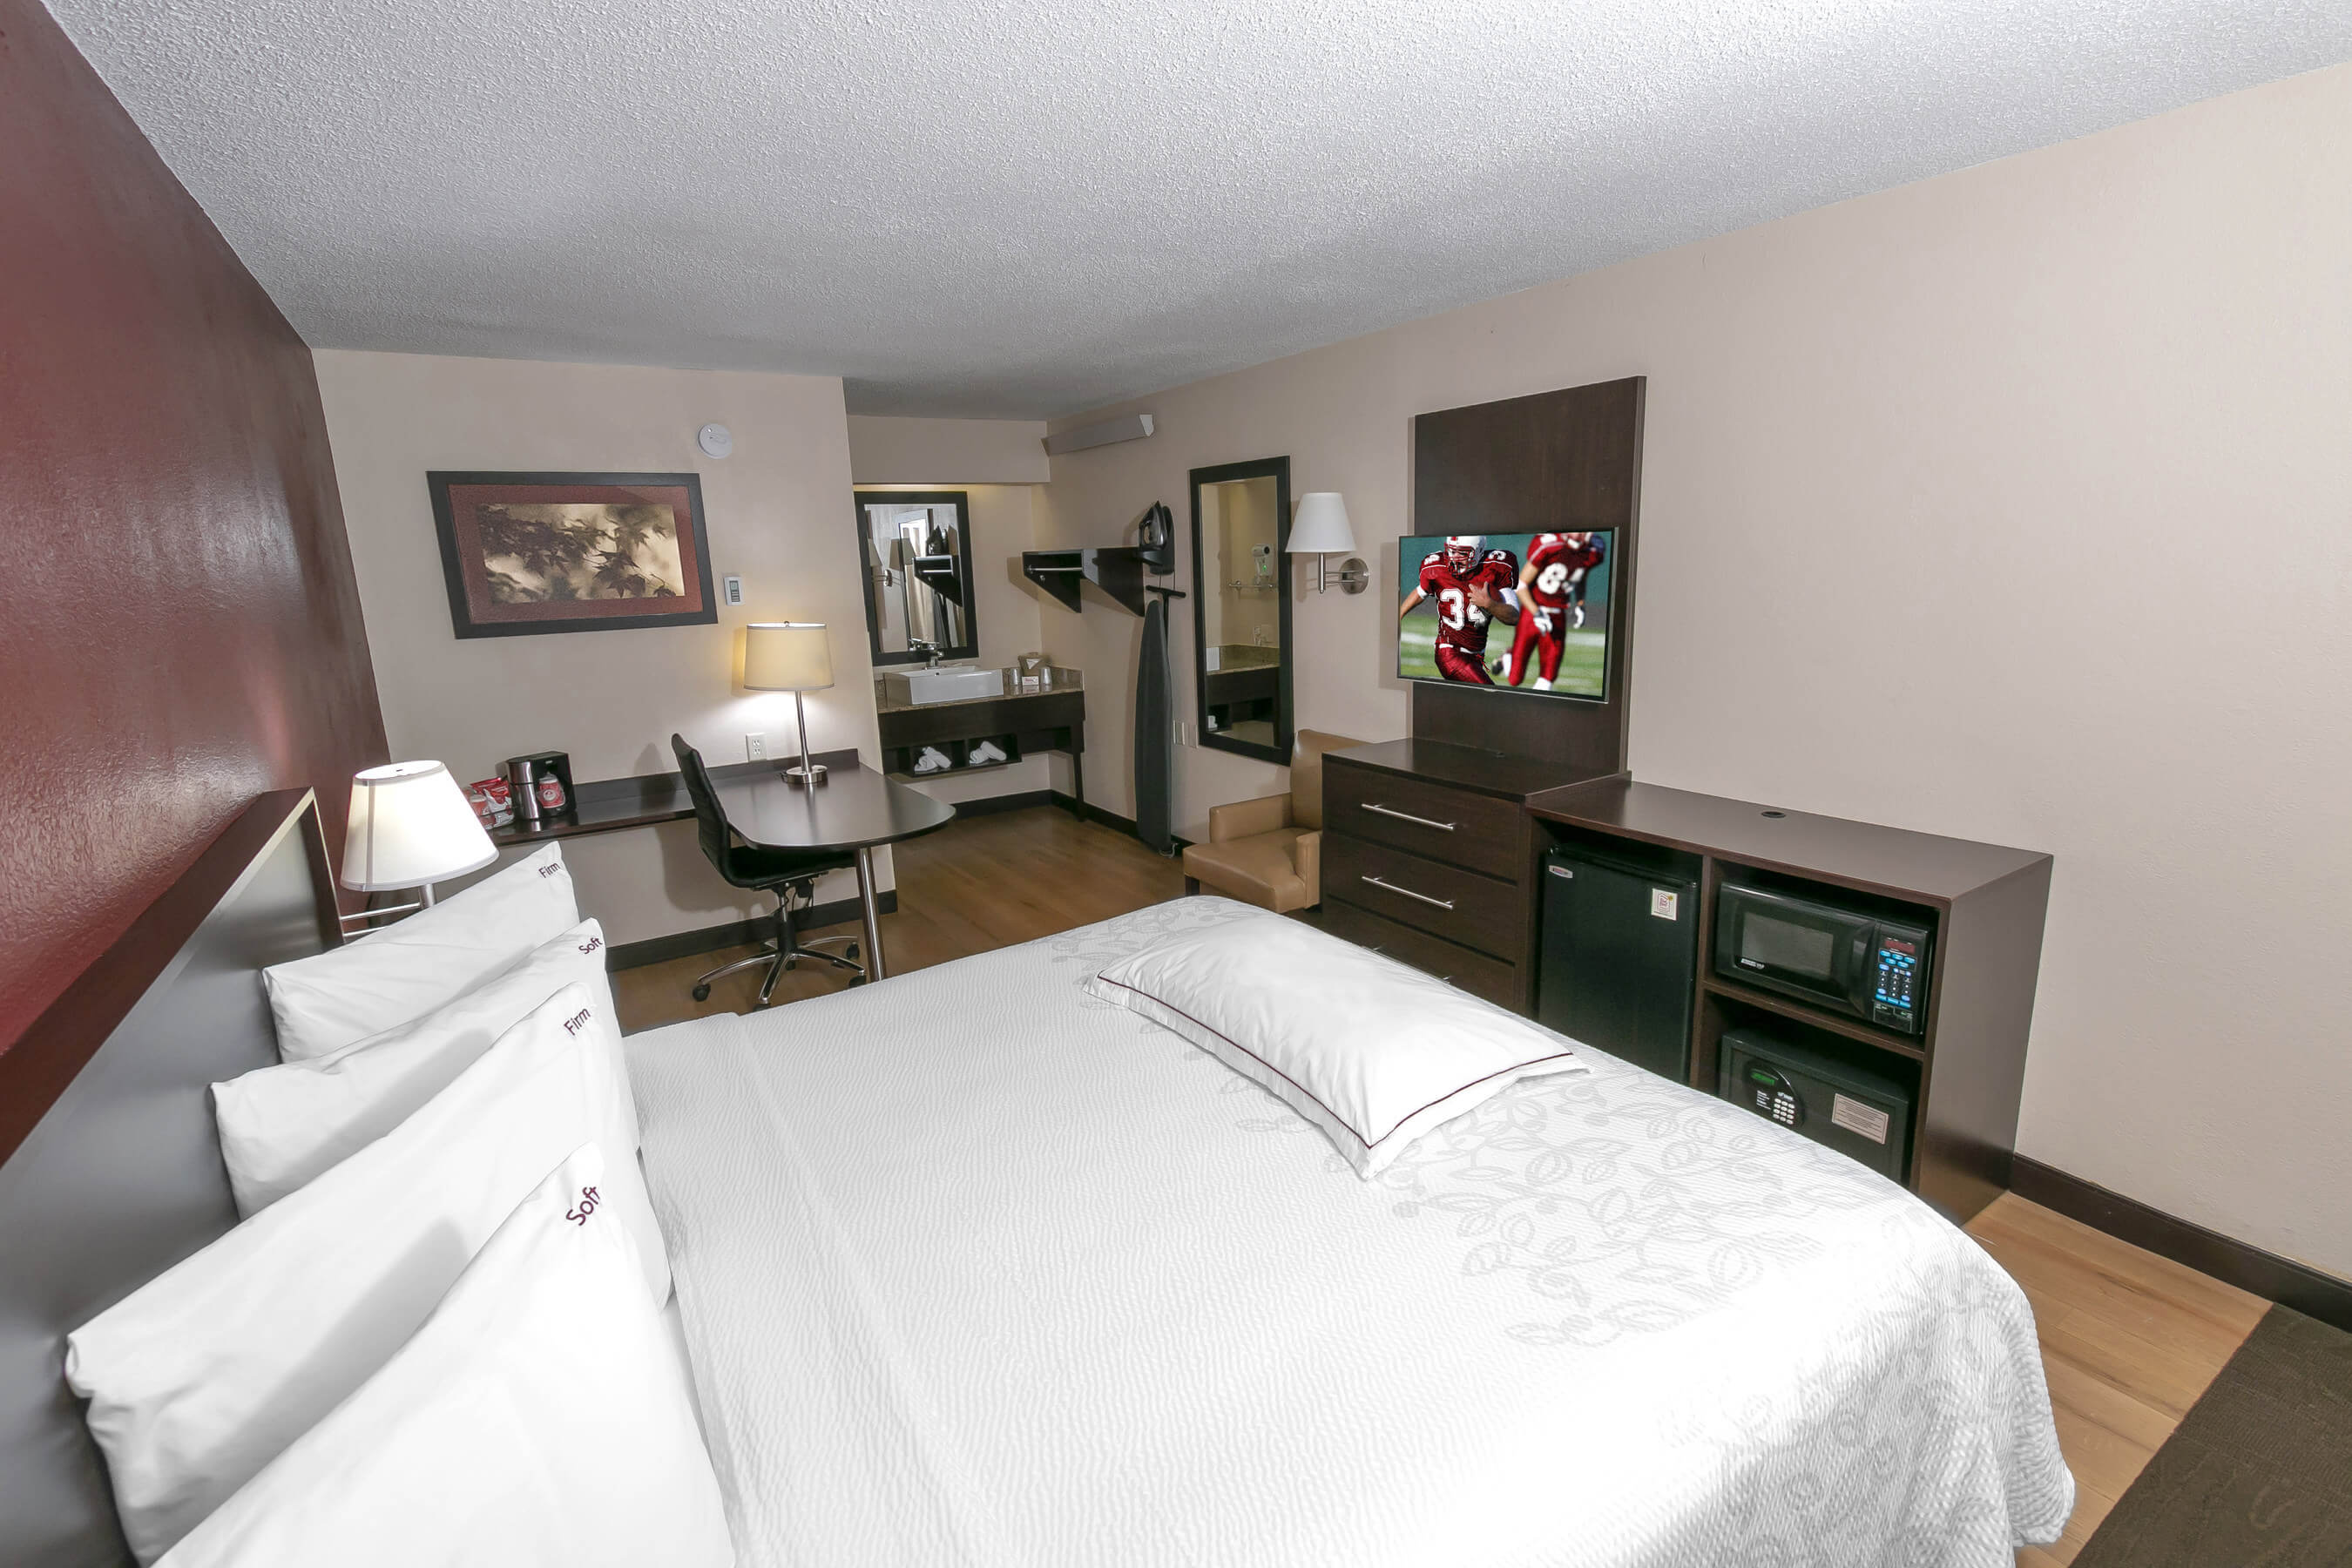 Best budget hotel brand in the U.S. named